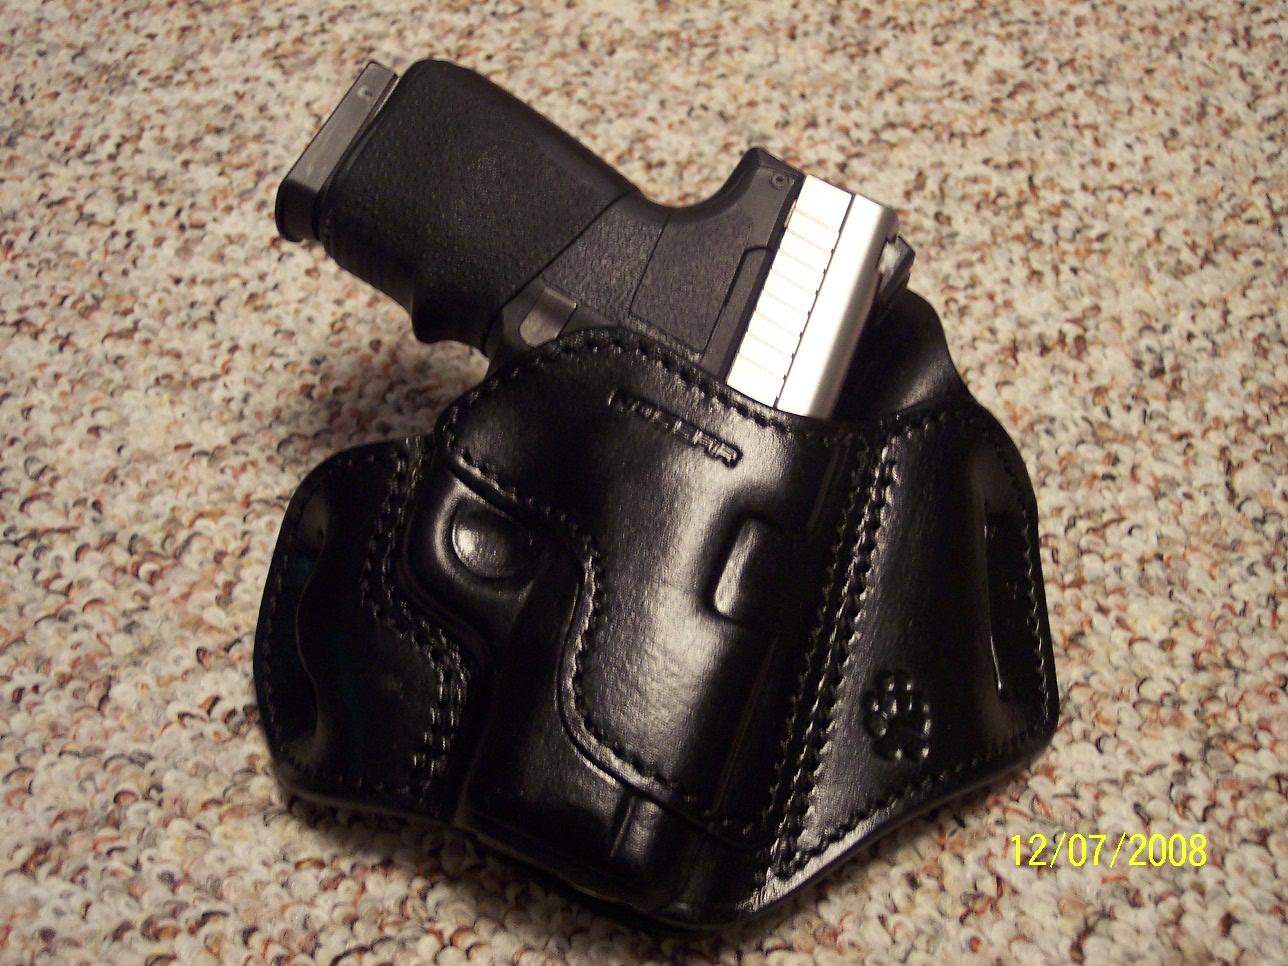 New NOSSAR leather for my PM45-new-nossar-holster-5.jpg